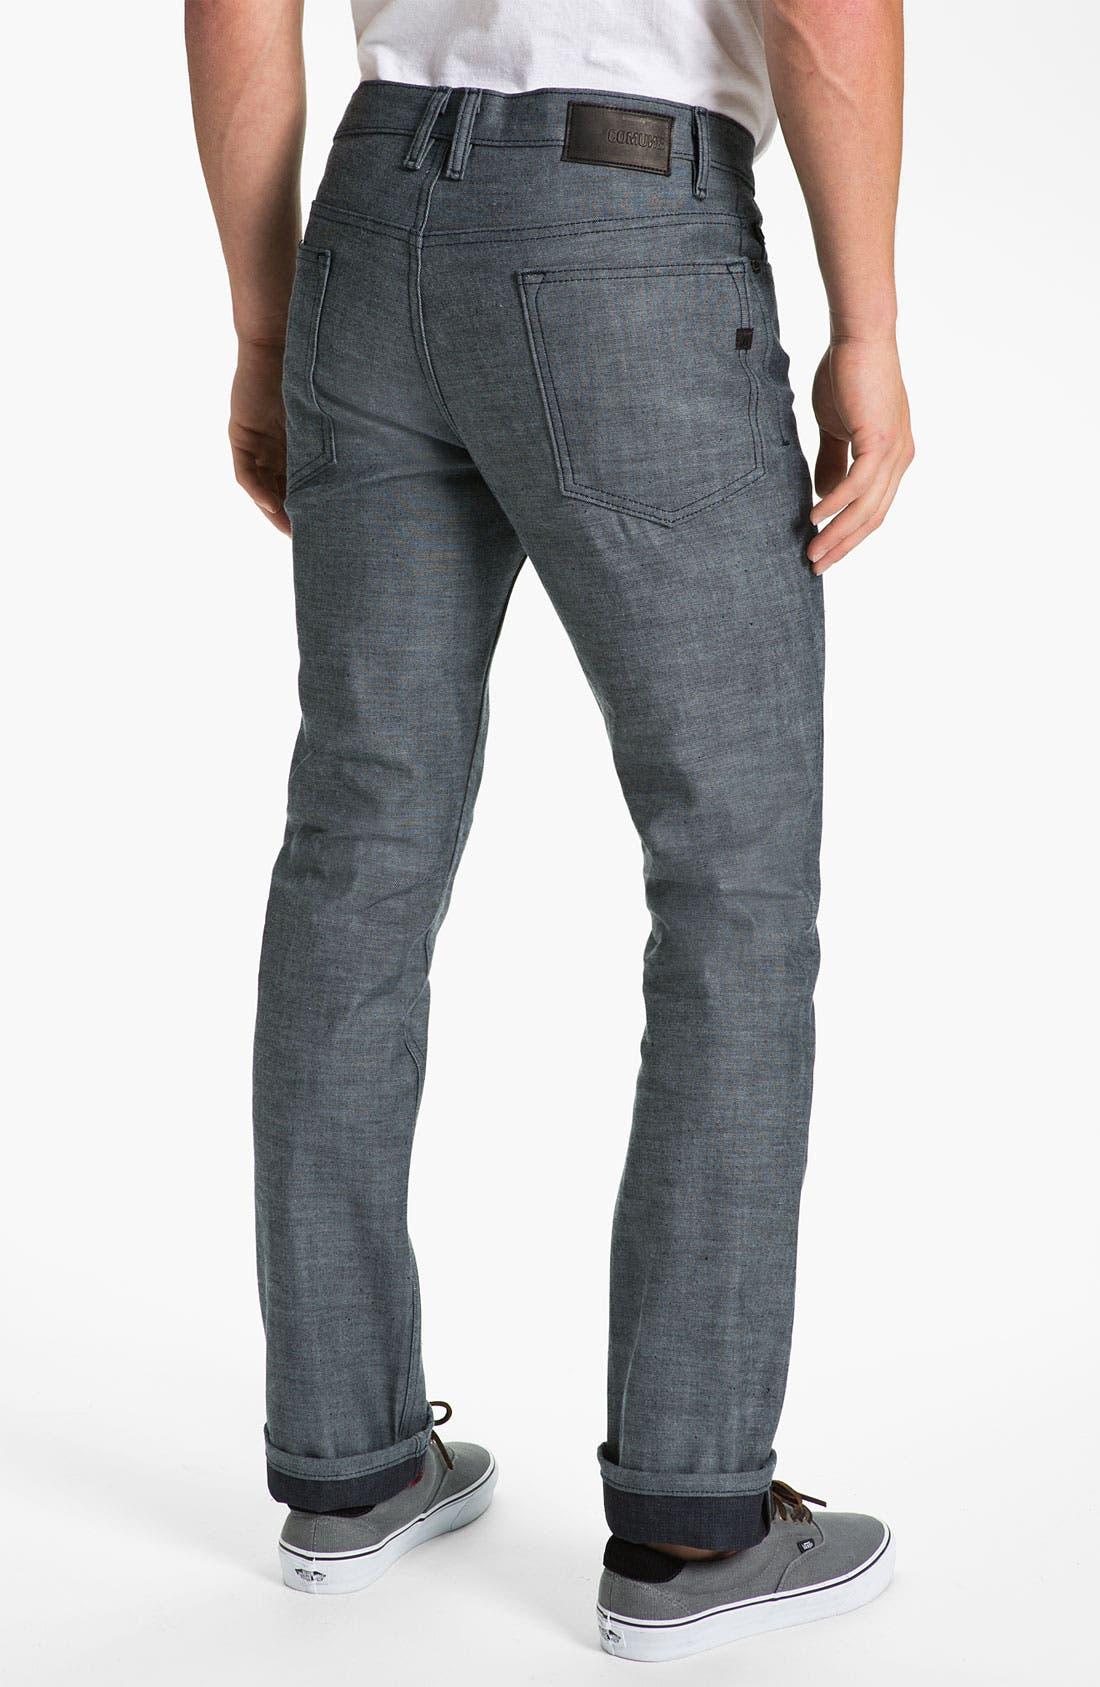 Alternate Image 1 Selected - Comune 'Ricky' Slim Straight Leg Jeans (Speckled Backside of Indigo)